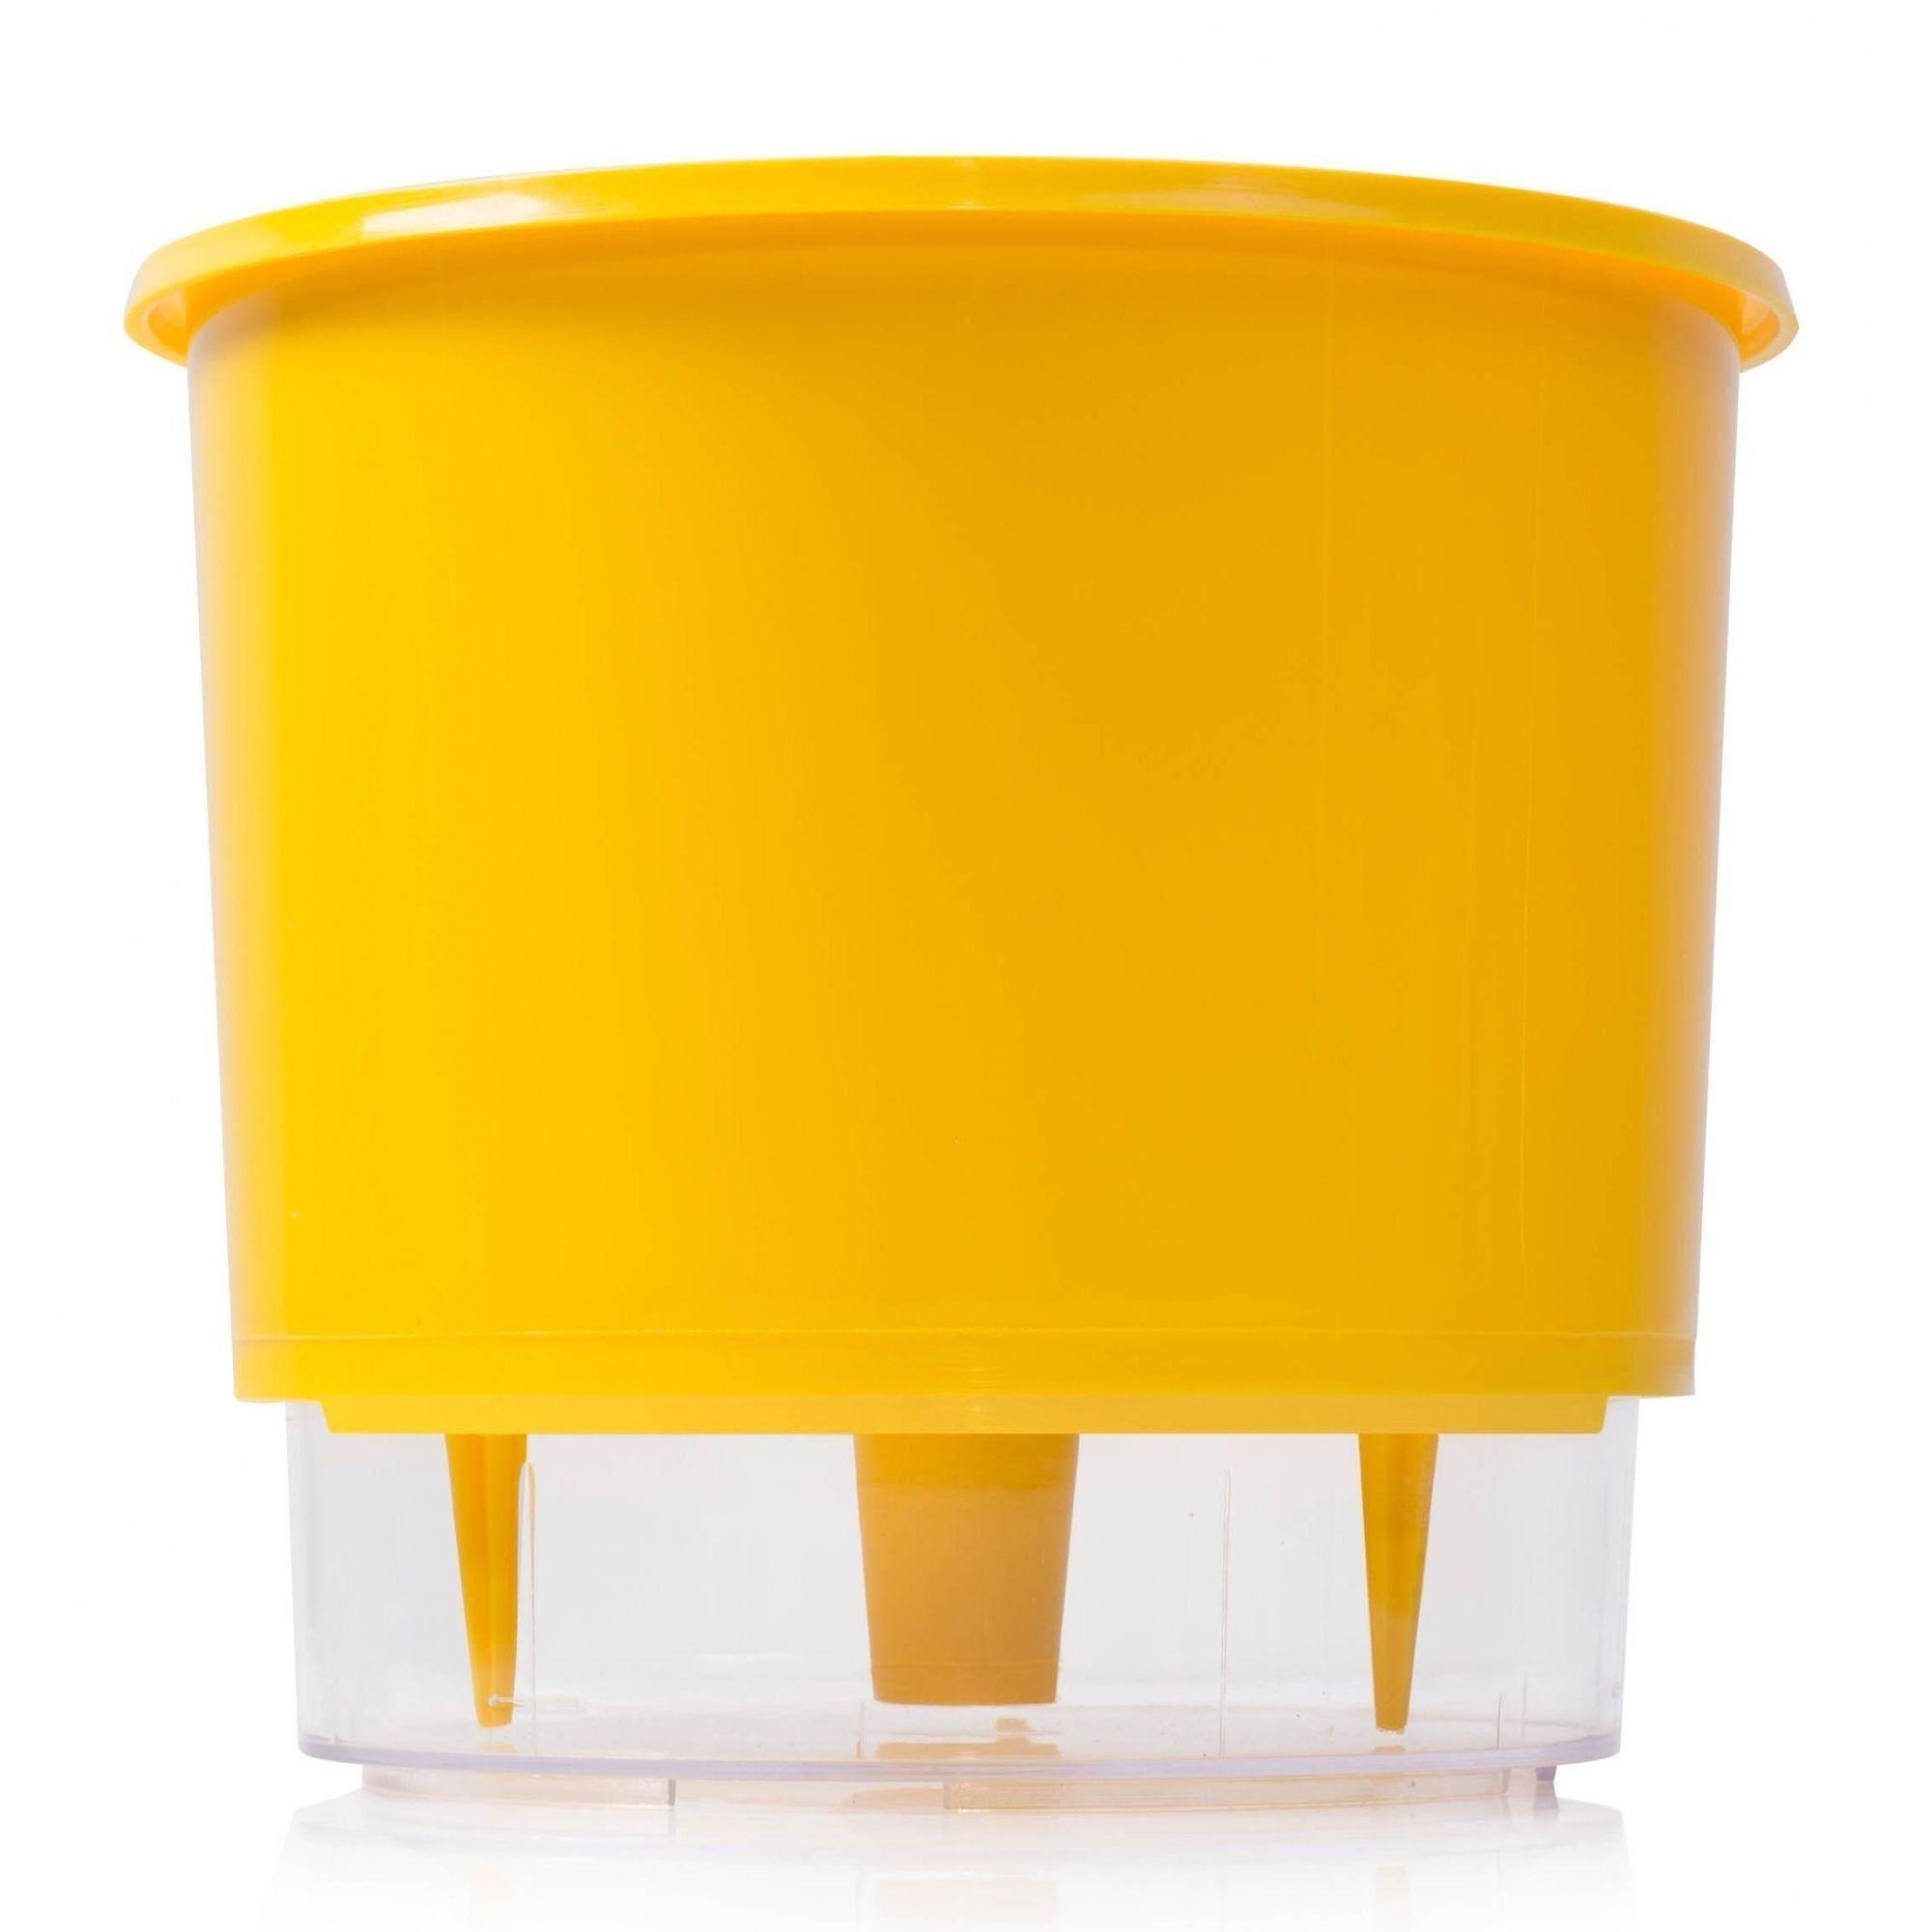 Vaso Autoirrigável Médio 16cm x 14cm Amarelo